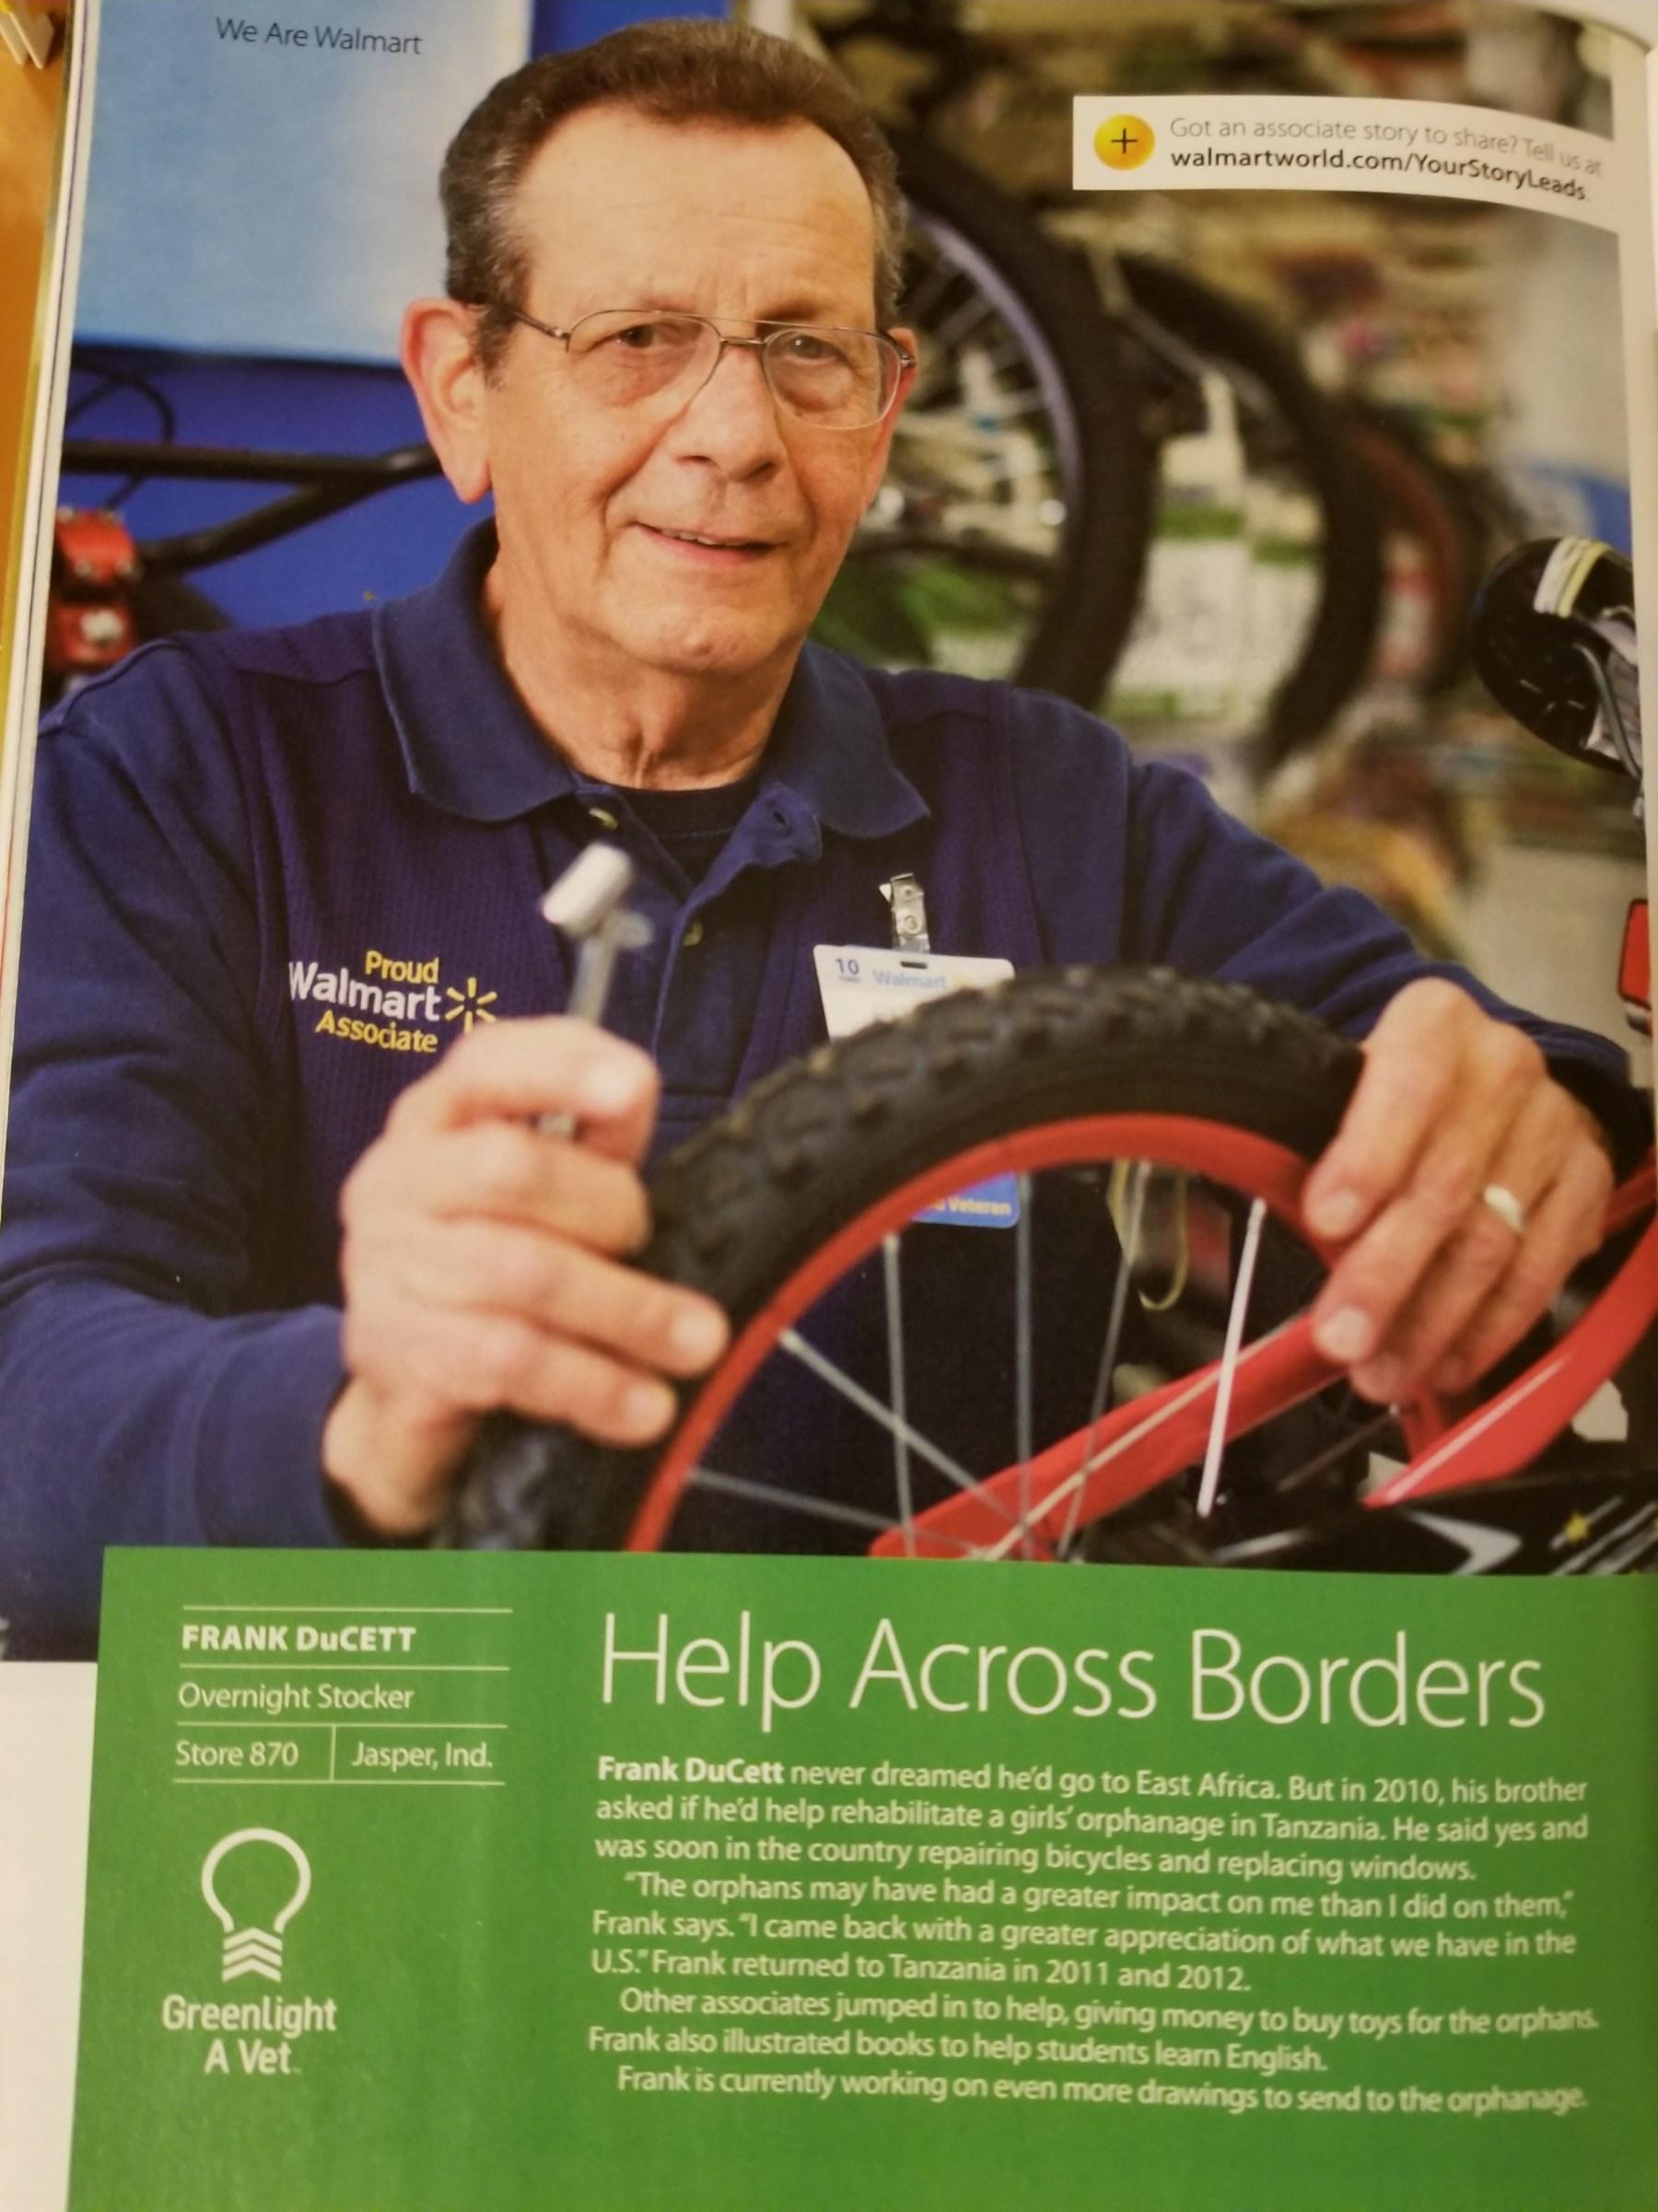 Frank DuCett in Wal-Mart trade magazine (2016)